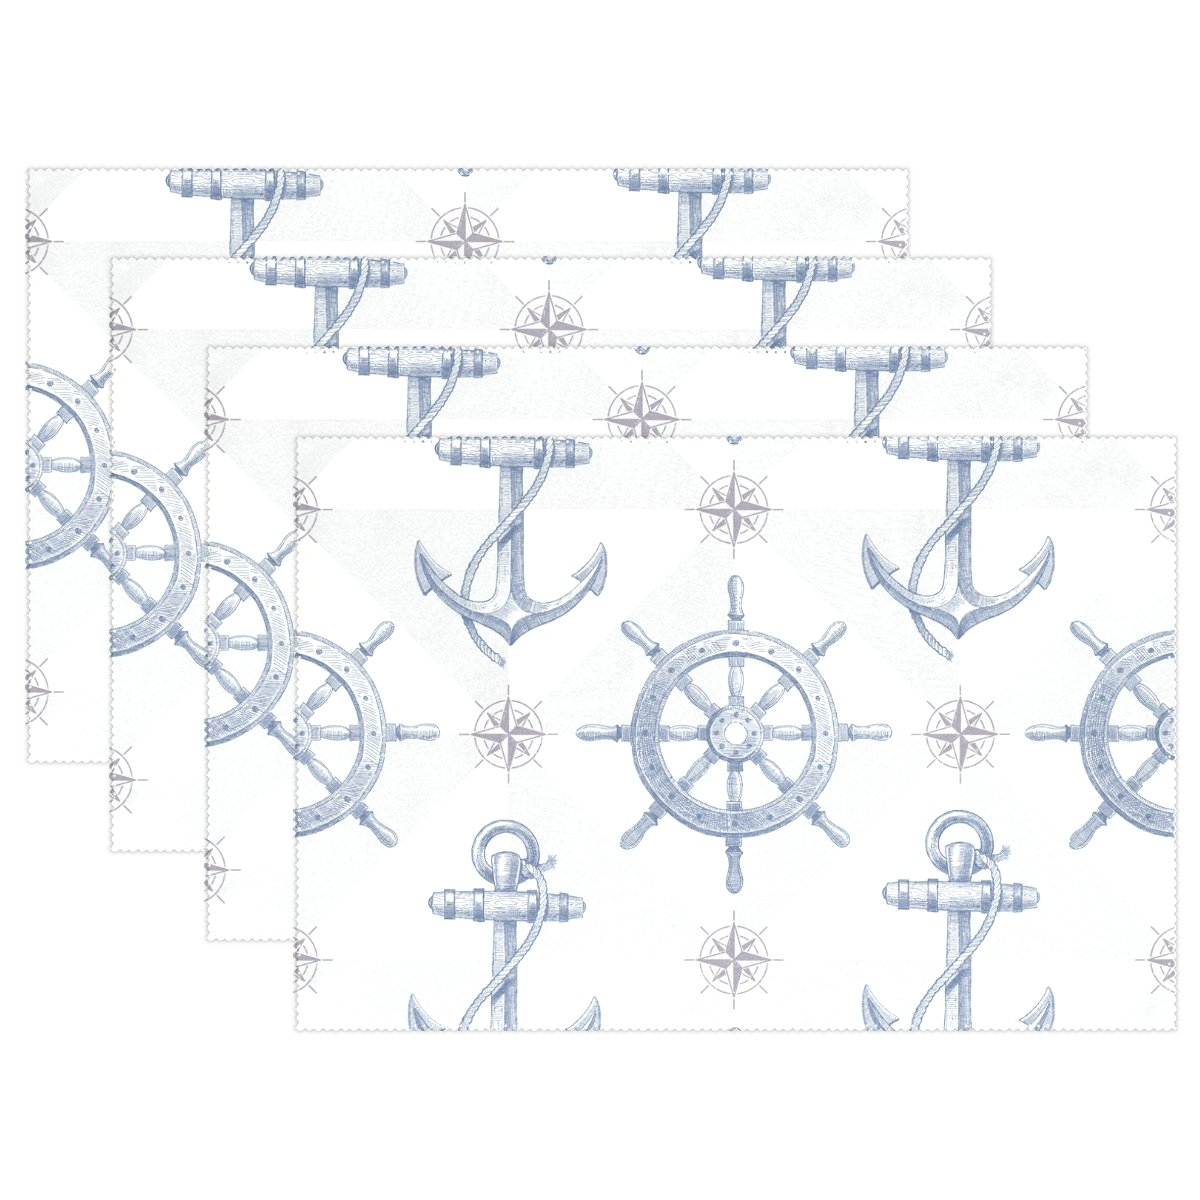 Nautical background with hand draw印刷、プレースマットalirea耐熱プレースマット汚れ防止滑り防止洗濯可能ポリエステルテーブルマット非スリップ洗濯可能プレースマット、12